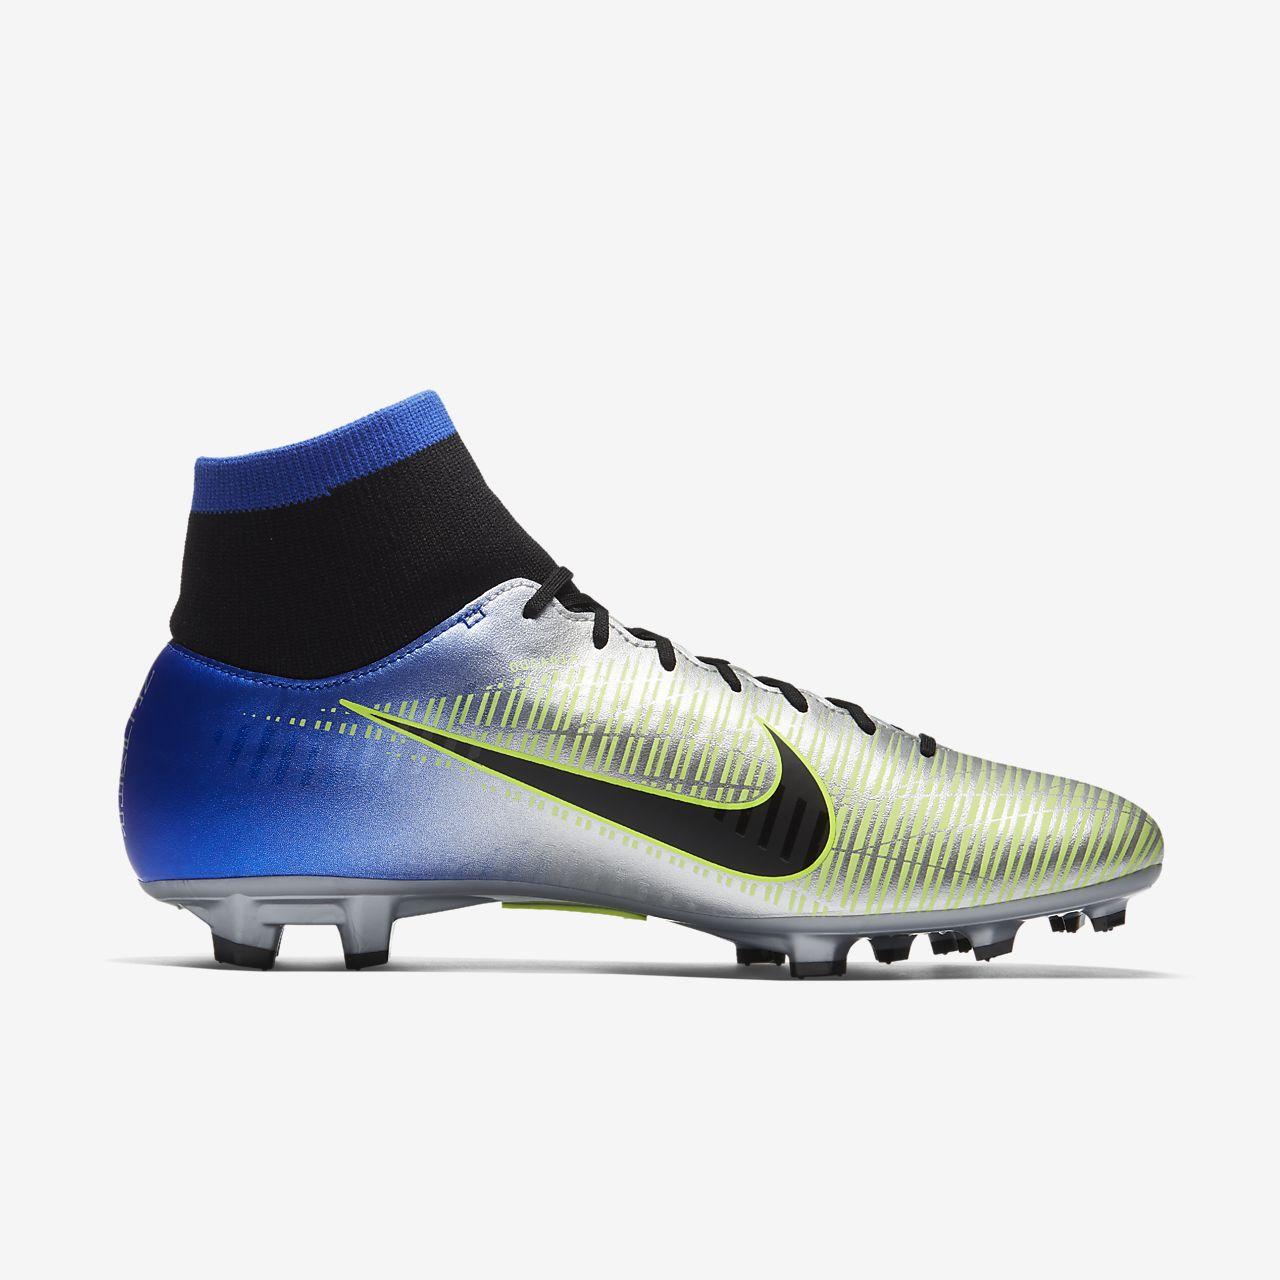 Neymar Chaussures Nike Mercurial Victoire Pour Les Hommes 8EaCx5yXA